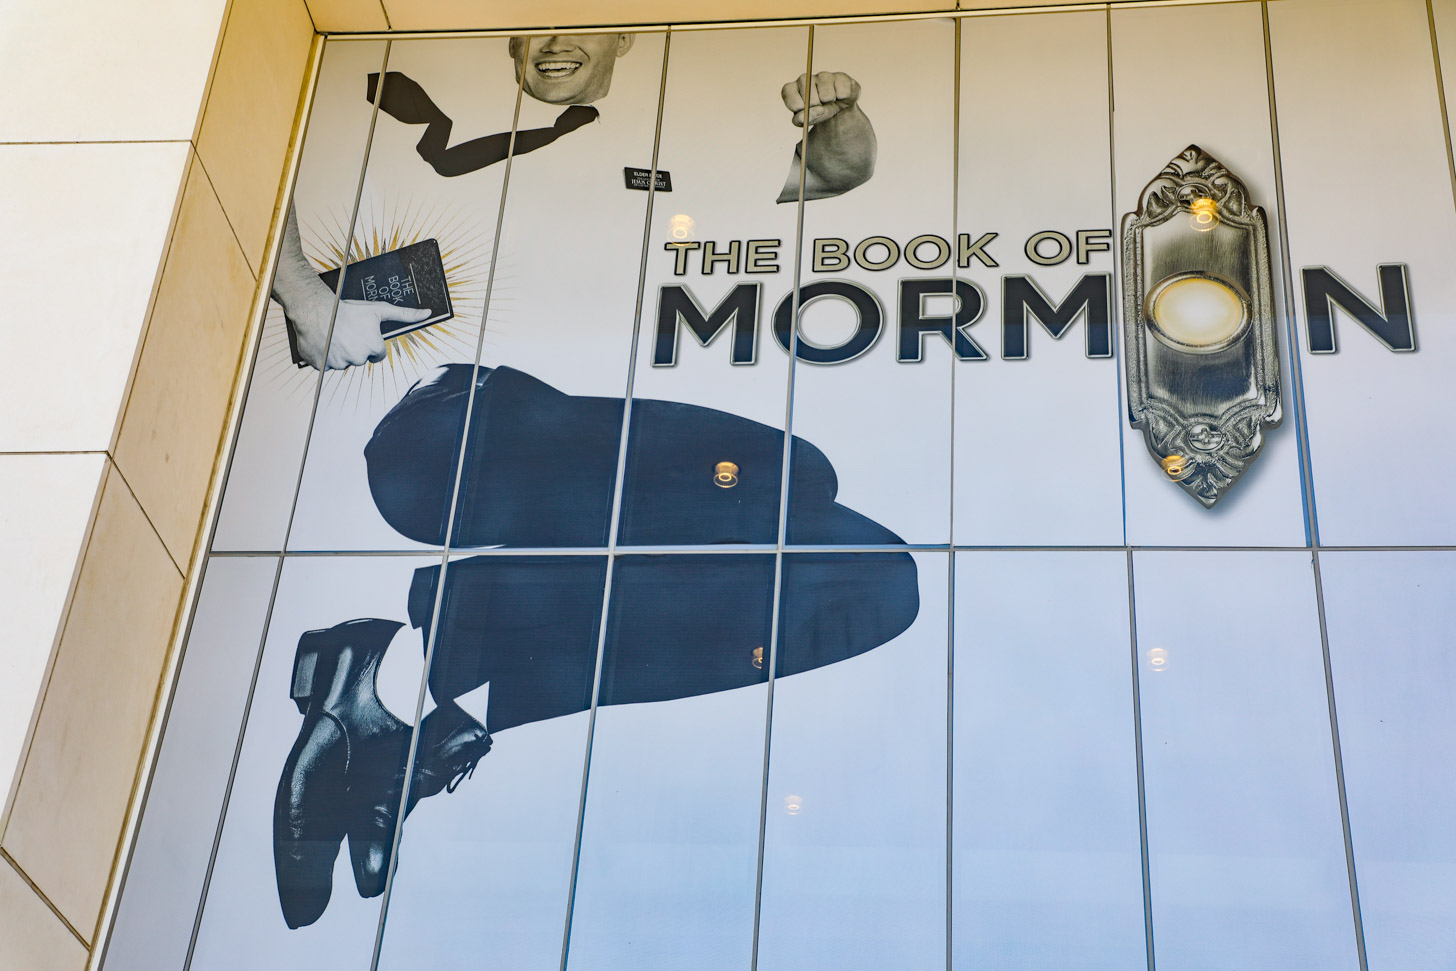 mormonen